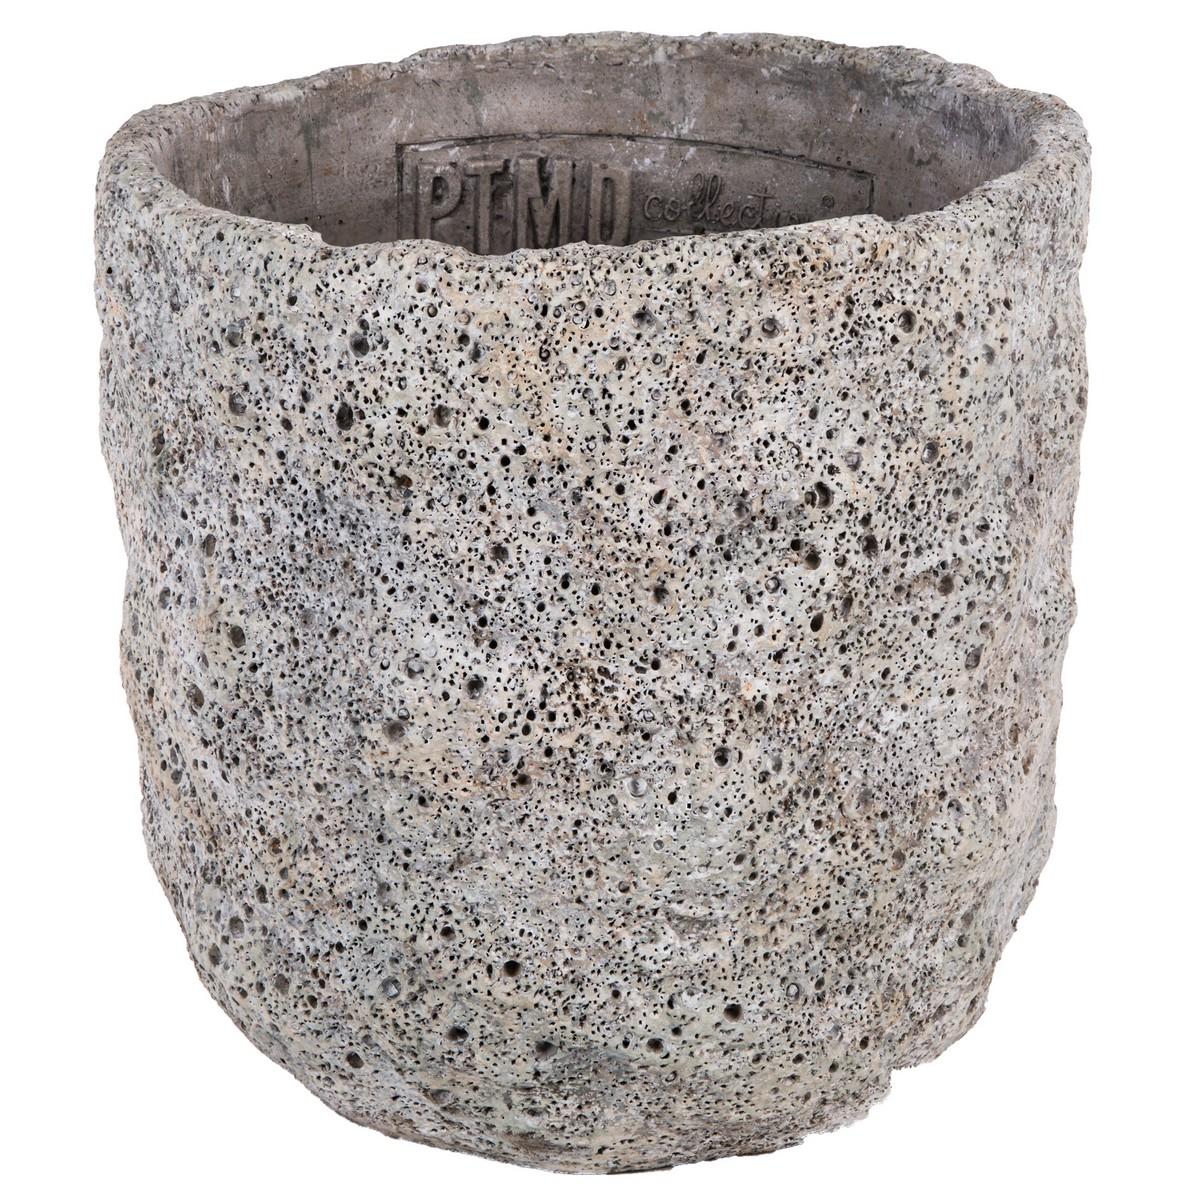 PTMD/Moonrock cement pot/656139【01】【取寄】